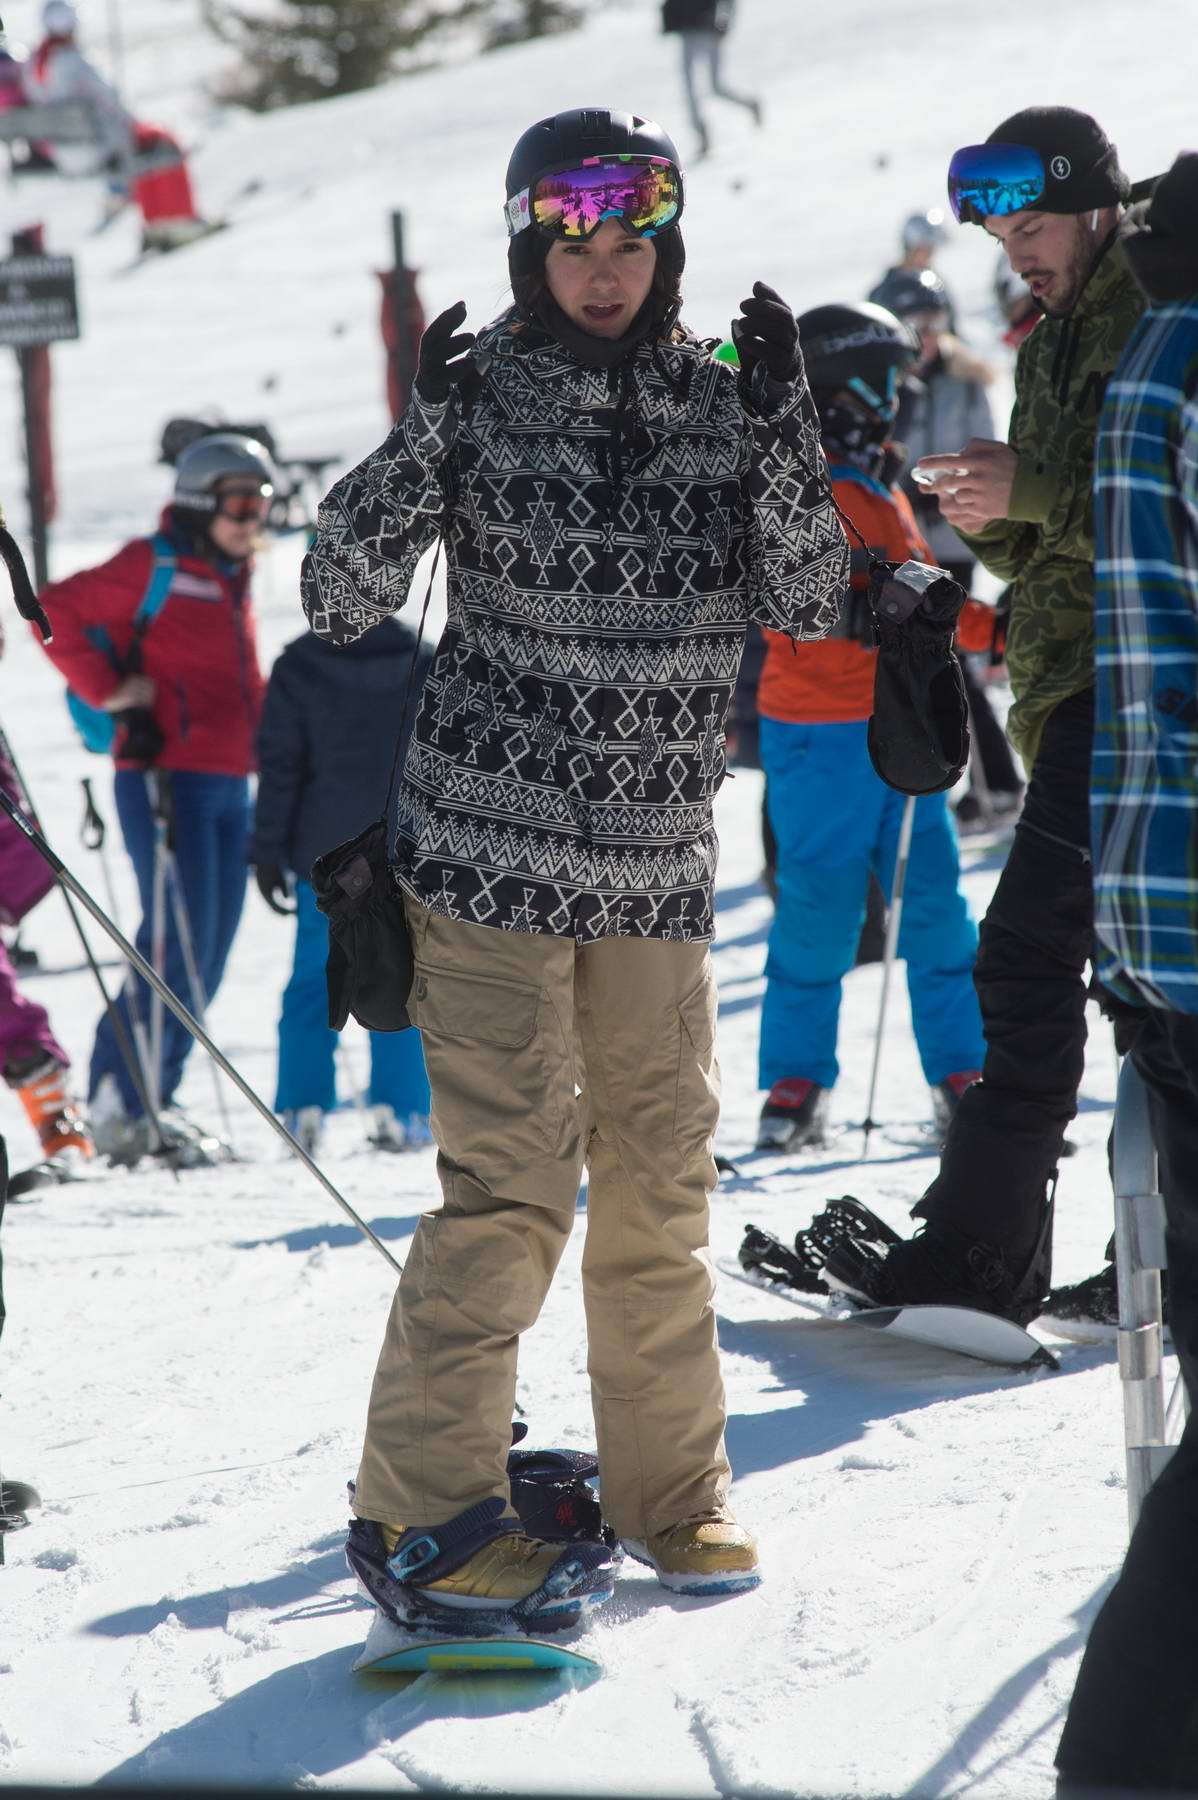 Nina Dobrev enjoys some snowboarding as she hits the slopes of Aspen, Colorado